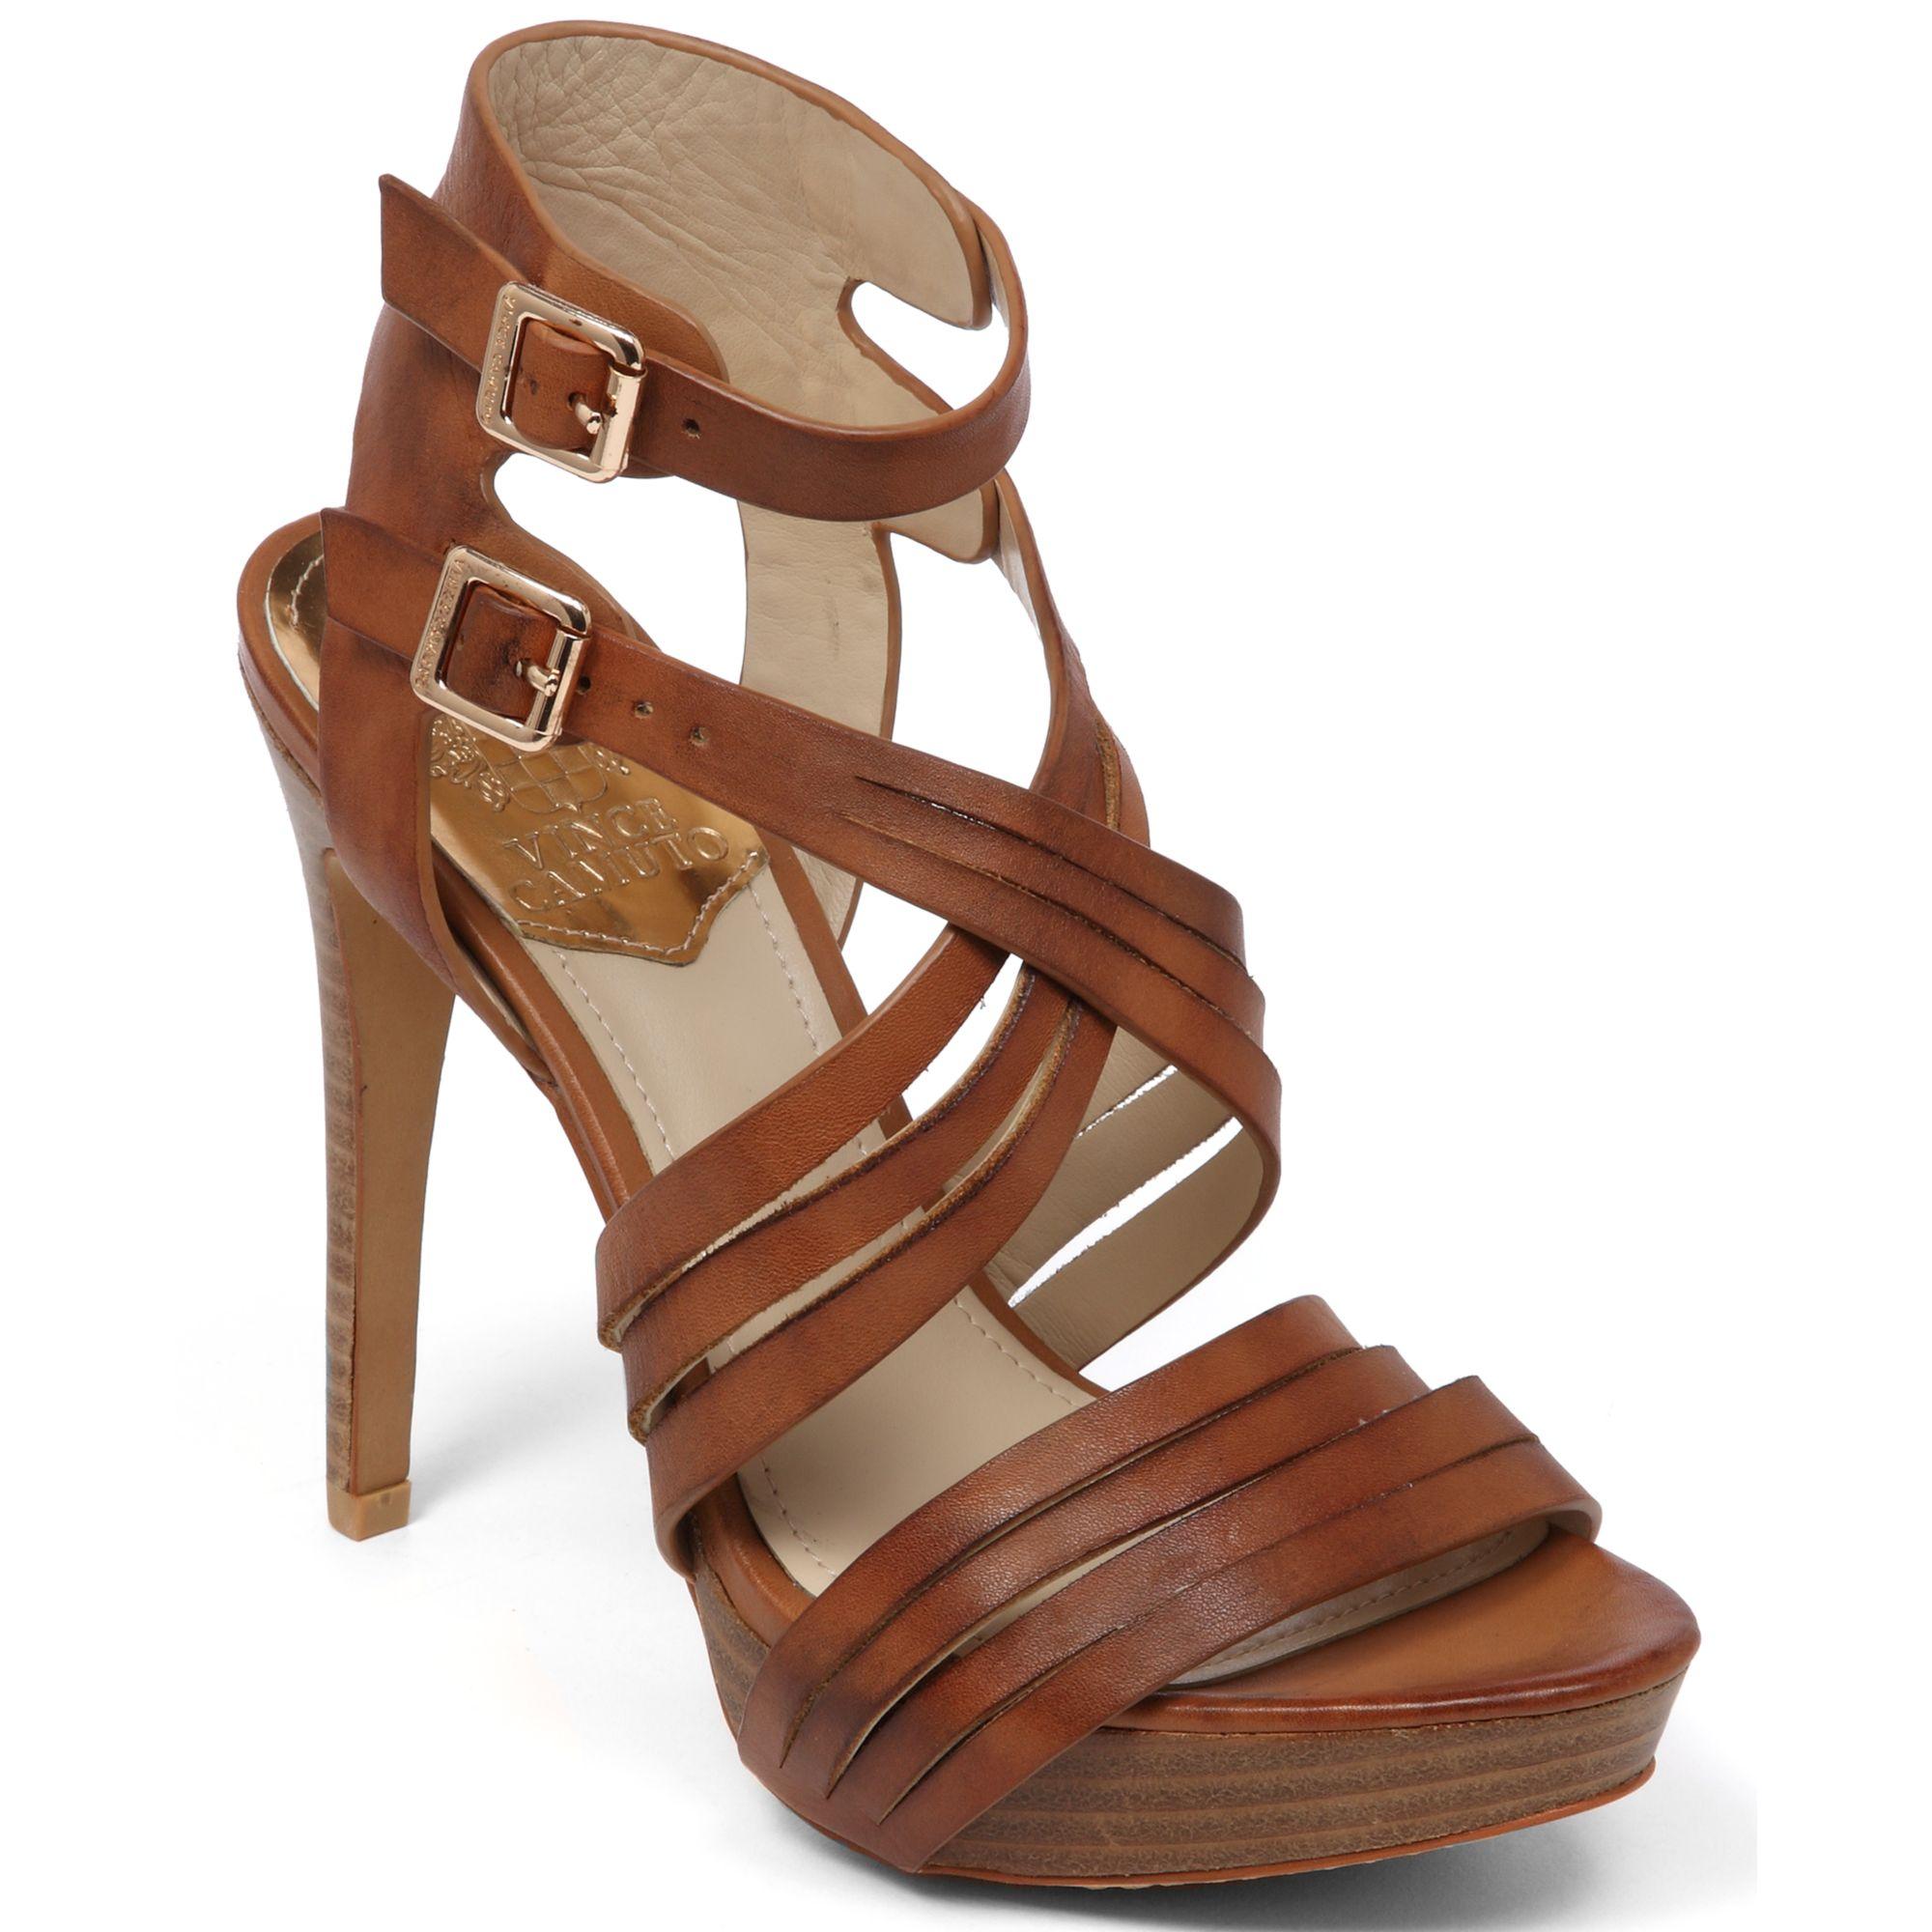 Vince Camuto Jistil High Heel Platform Sandals In Brown